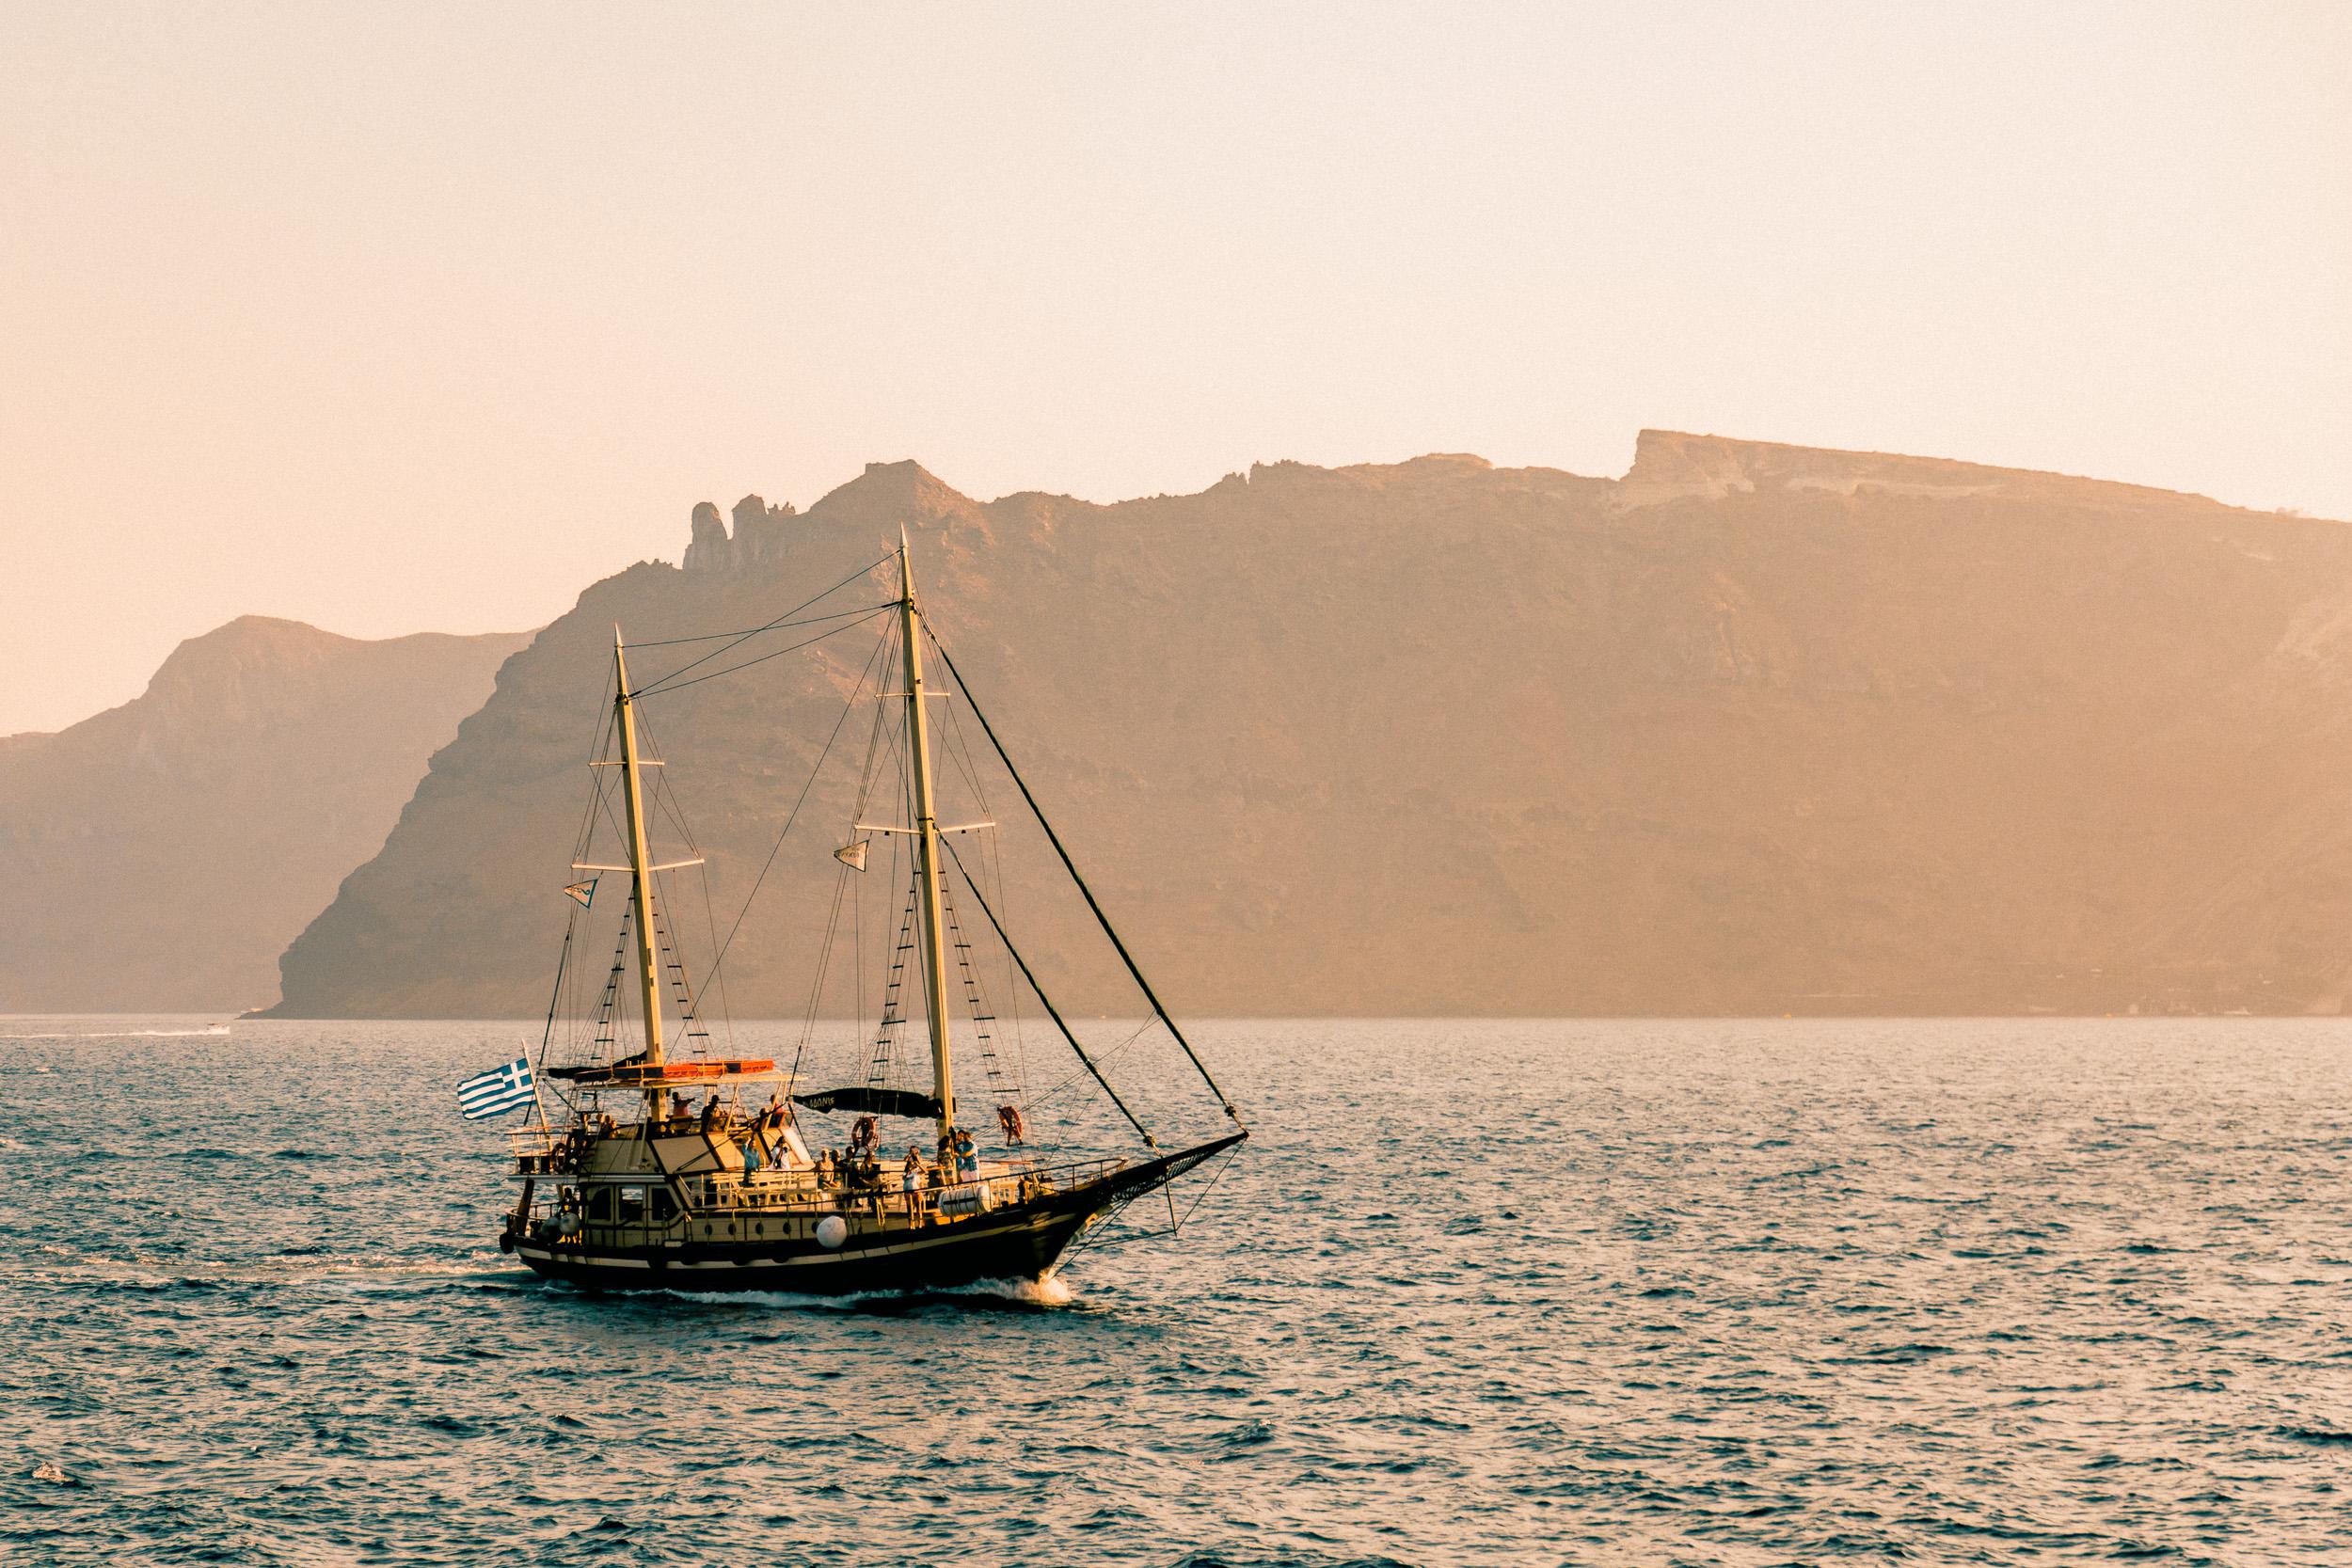 33-santorini-greece-sunset-sailboat-cyclades-aegean-sea-anna-elina-lahti-photographer.jpg